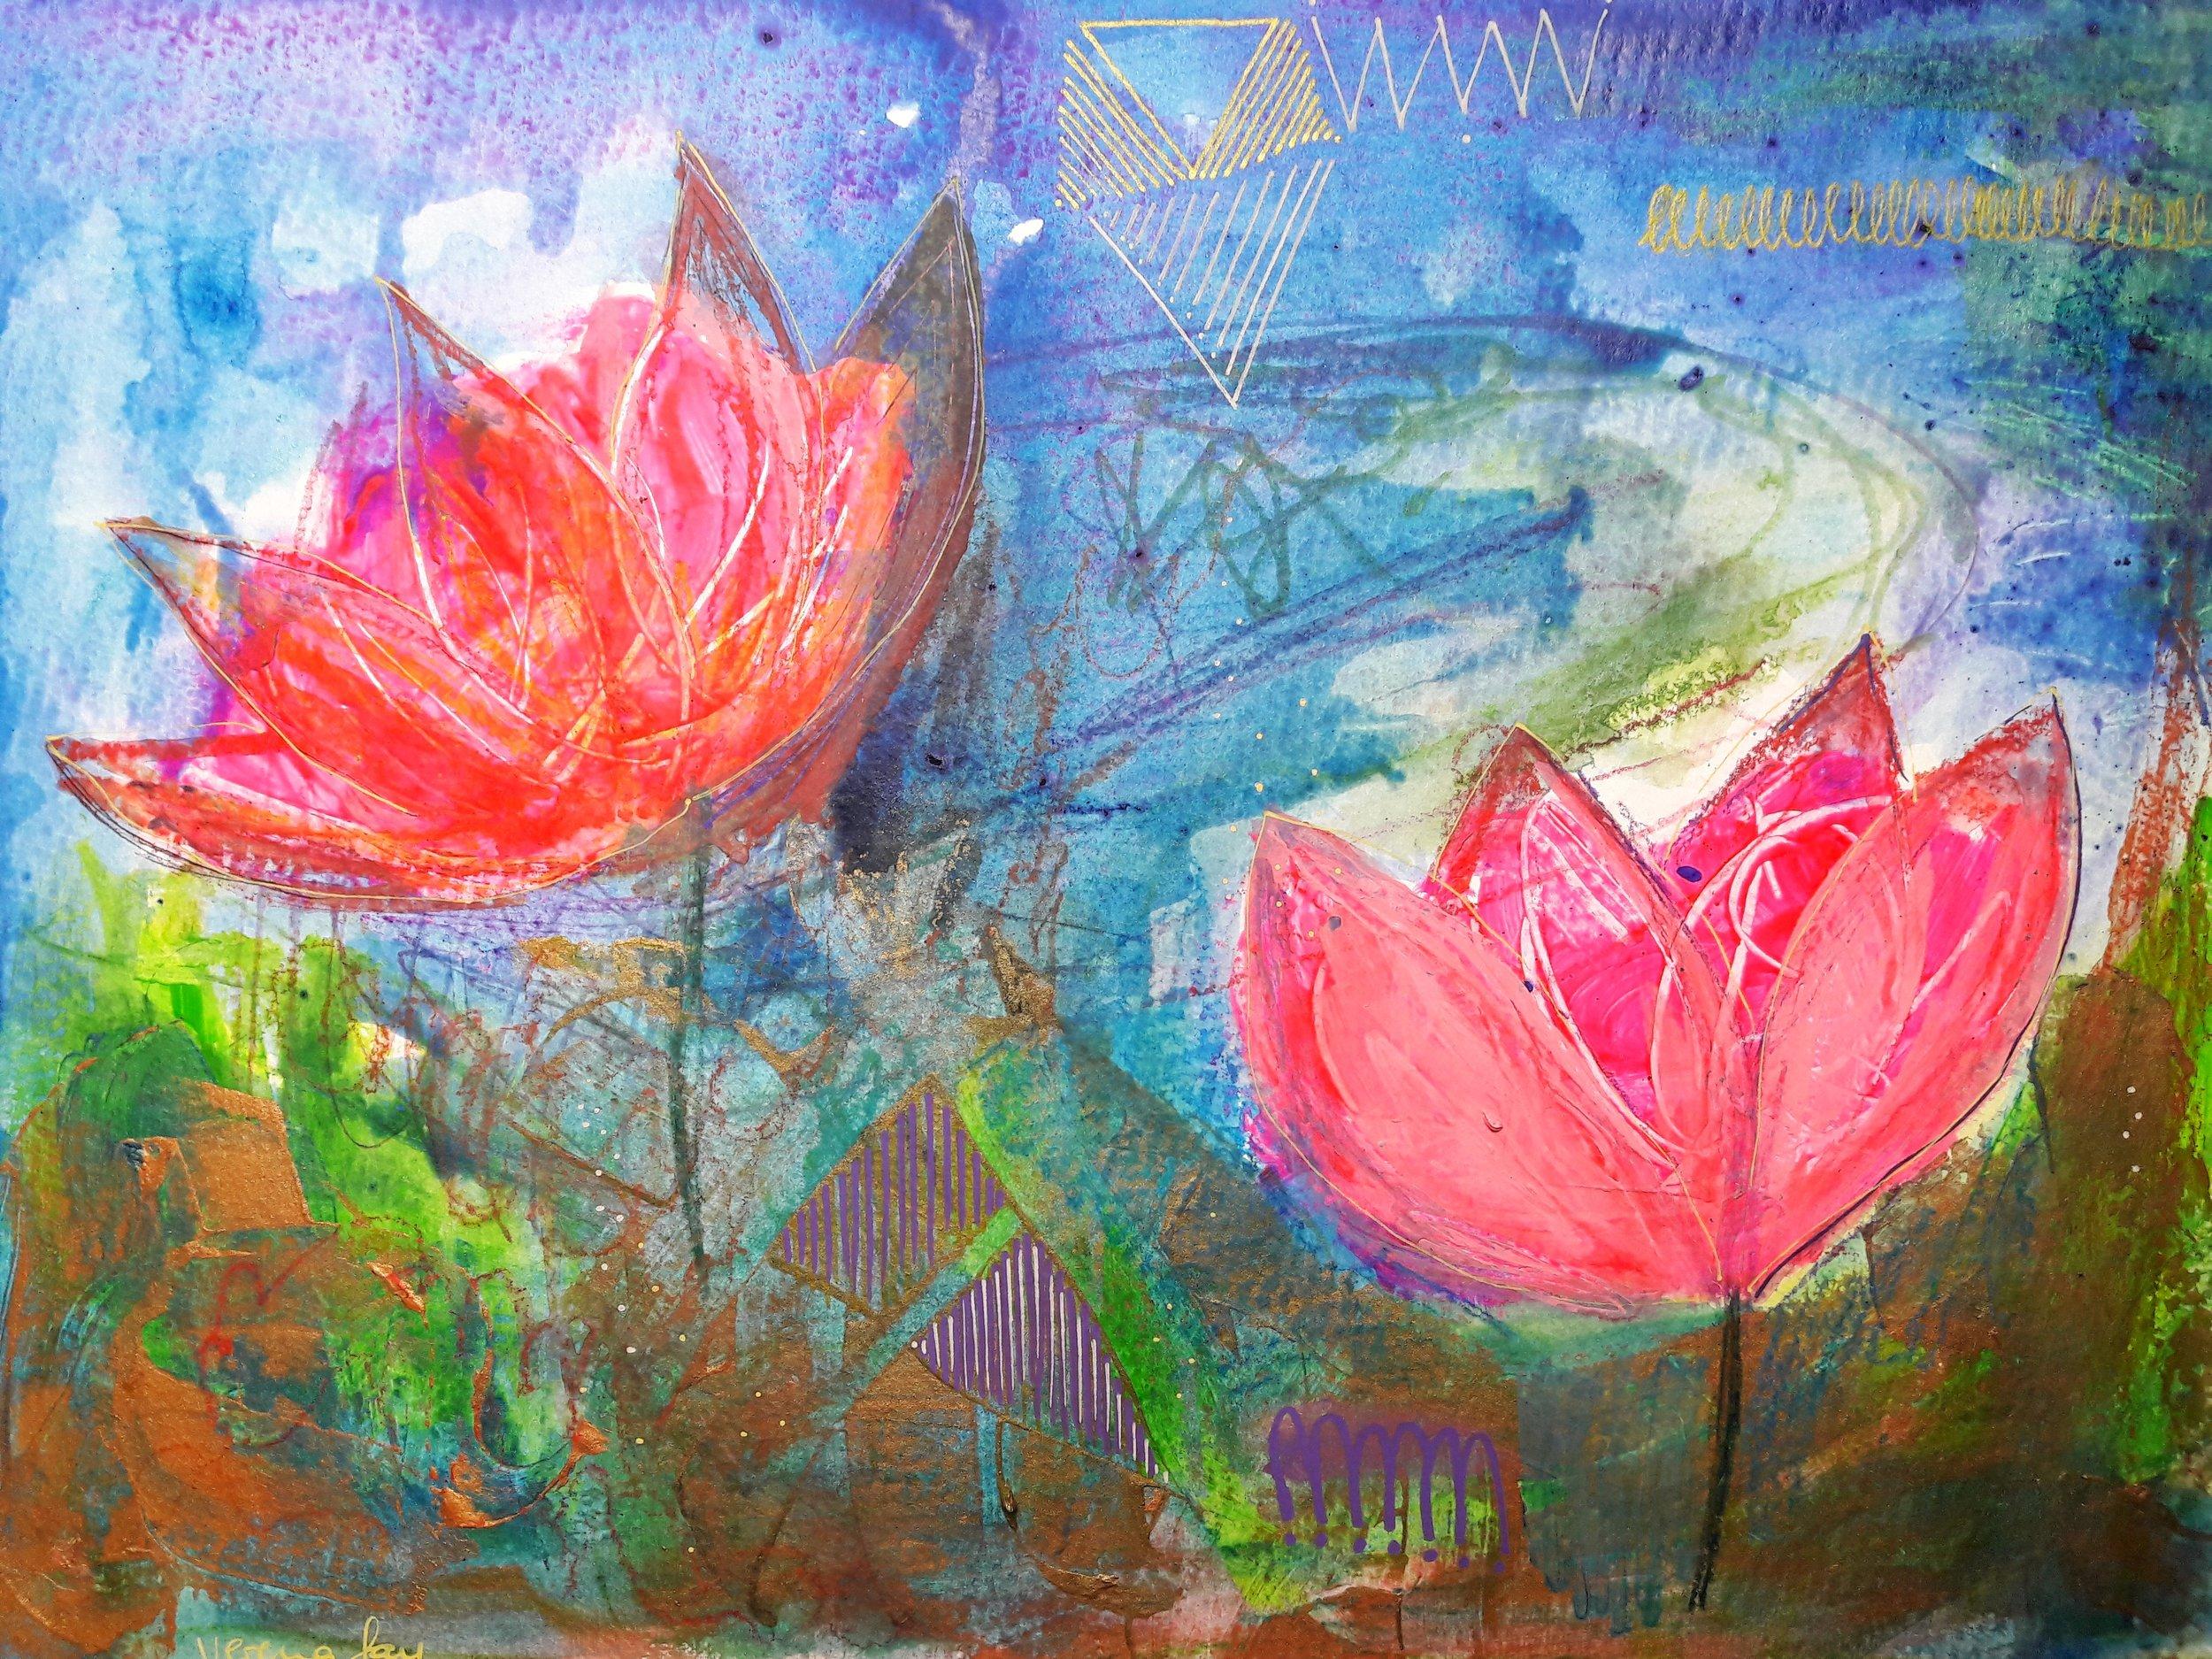 WATERLOVE Acrylic on Paper 360g/m2 24 x 32 cm | 9.4 x 12.5 in